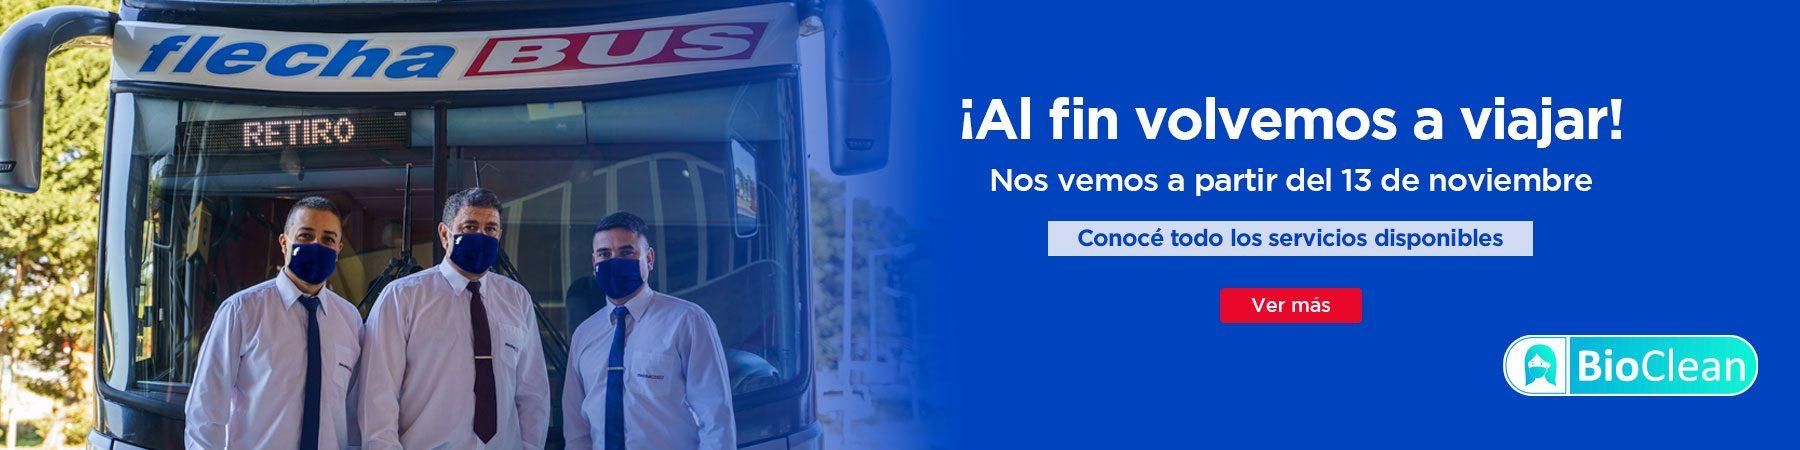 vuelve transporte terrestre viajar micro flecha bus argentina 2020 coronavirus